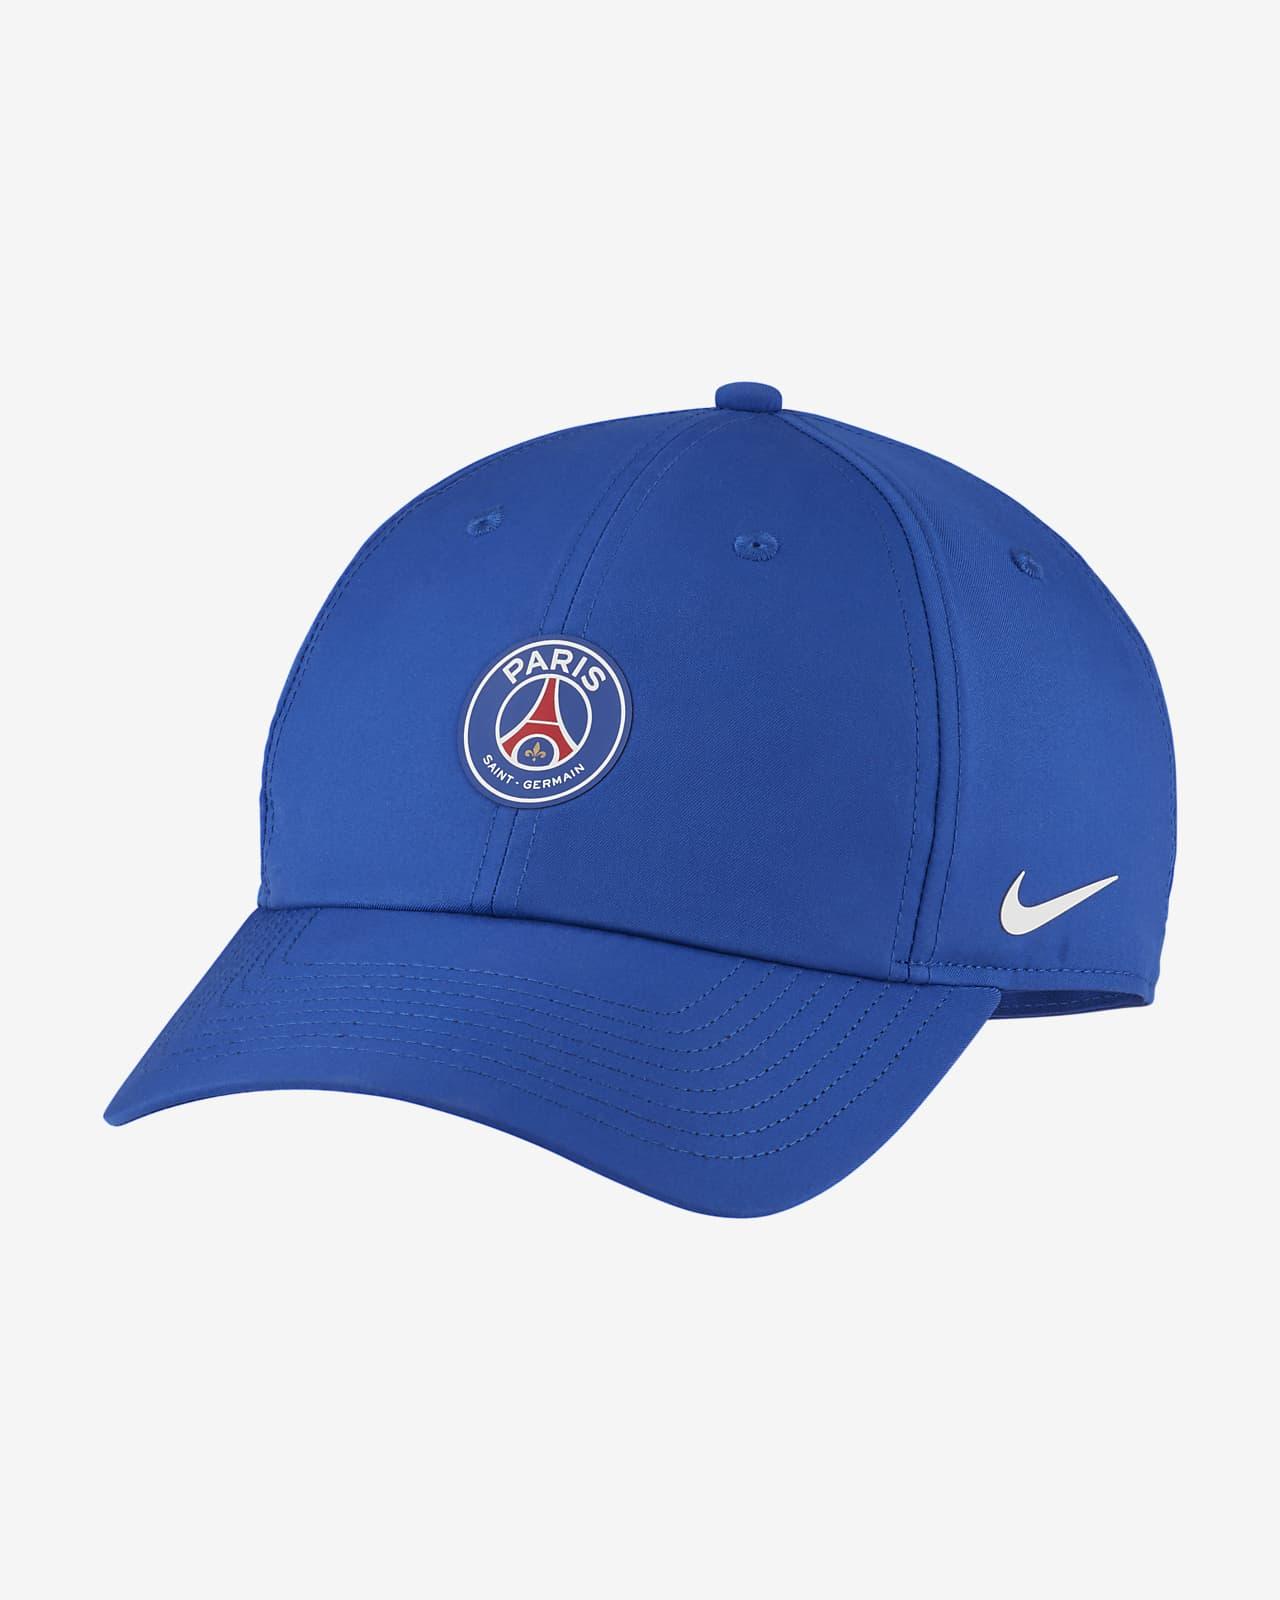 Nike Dri-FIT Paris Saint-Germain Heritage86 Adjustable Hat